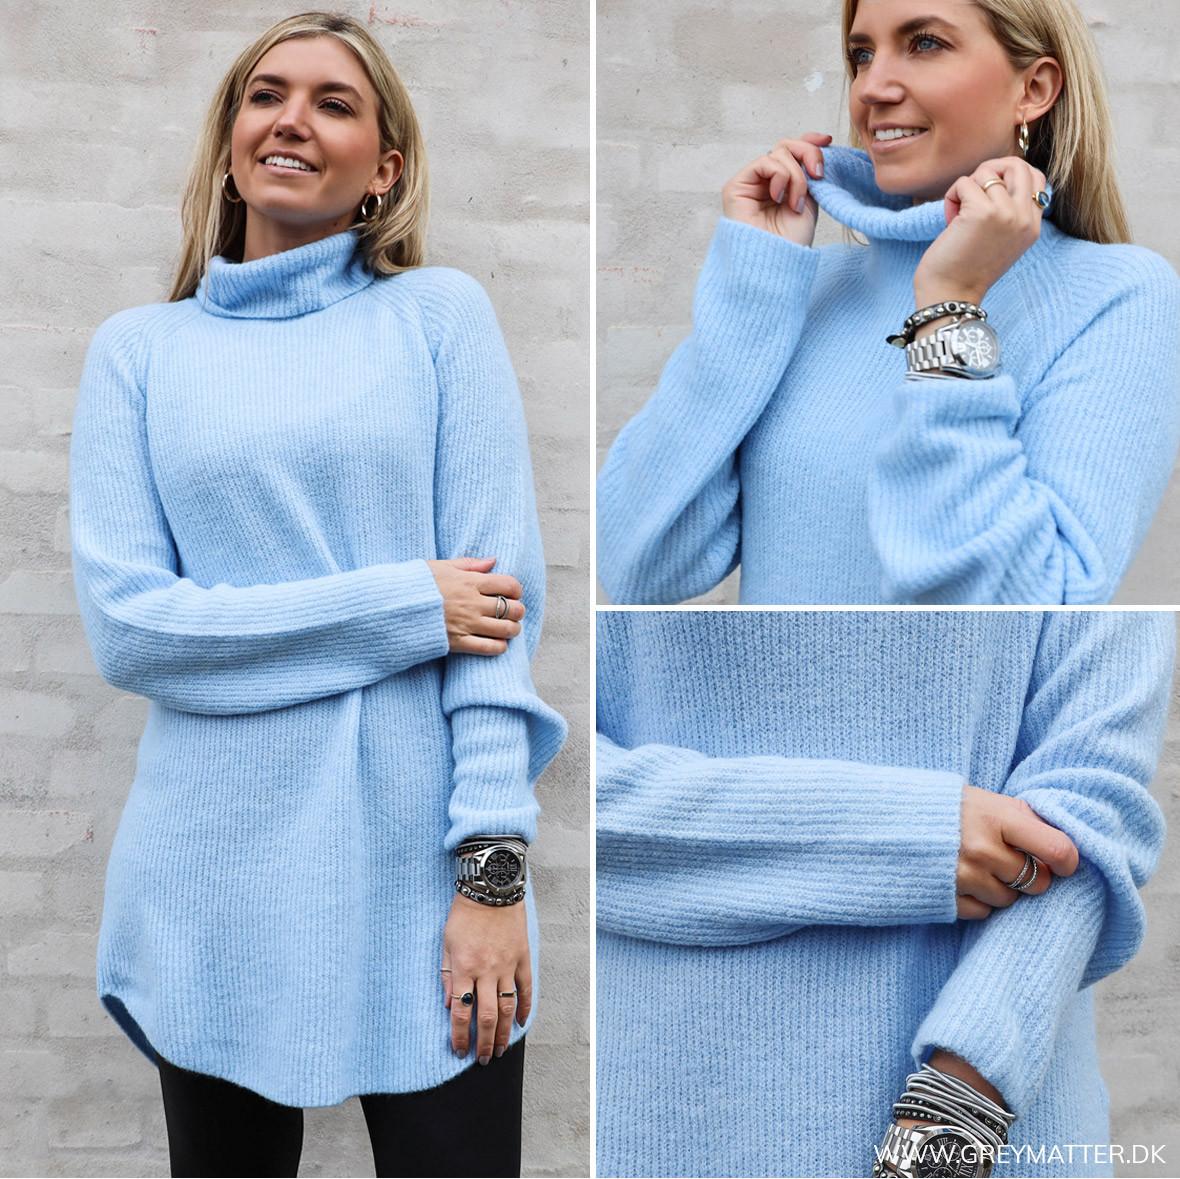 blu_knit_greymatter.jpg